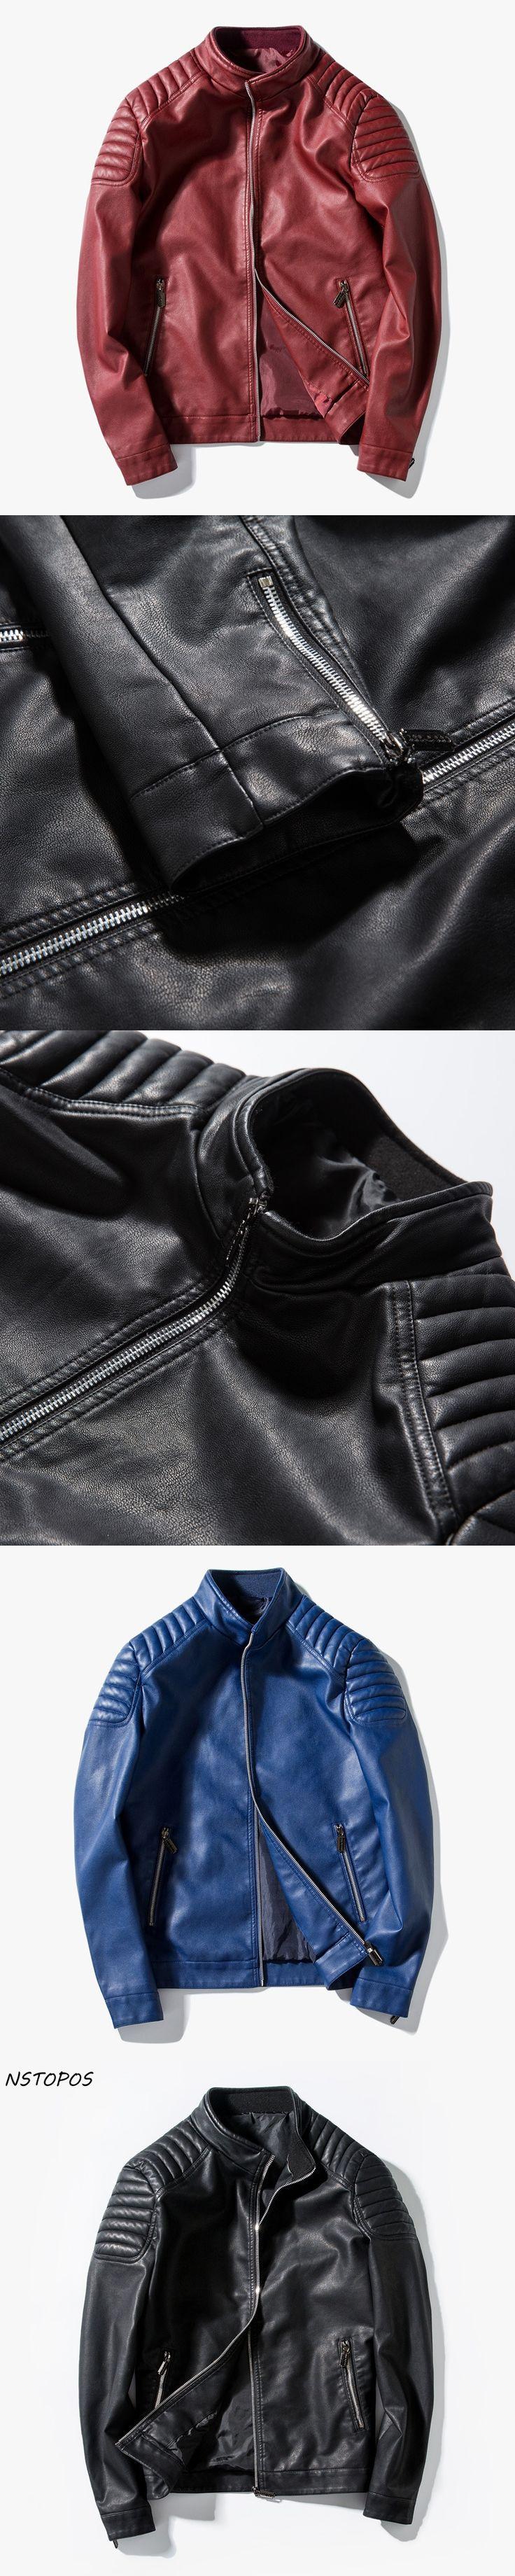 2017 Mens Leather Jacket Slim Fit Motorcycle Zipper PU Jacket  Black Red Blue Men Faux Leather Jacket M-3XL Autumn Leather Coat